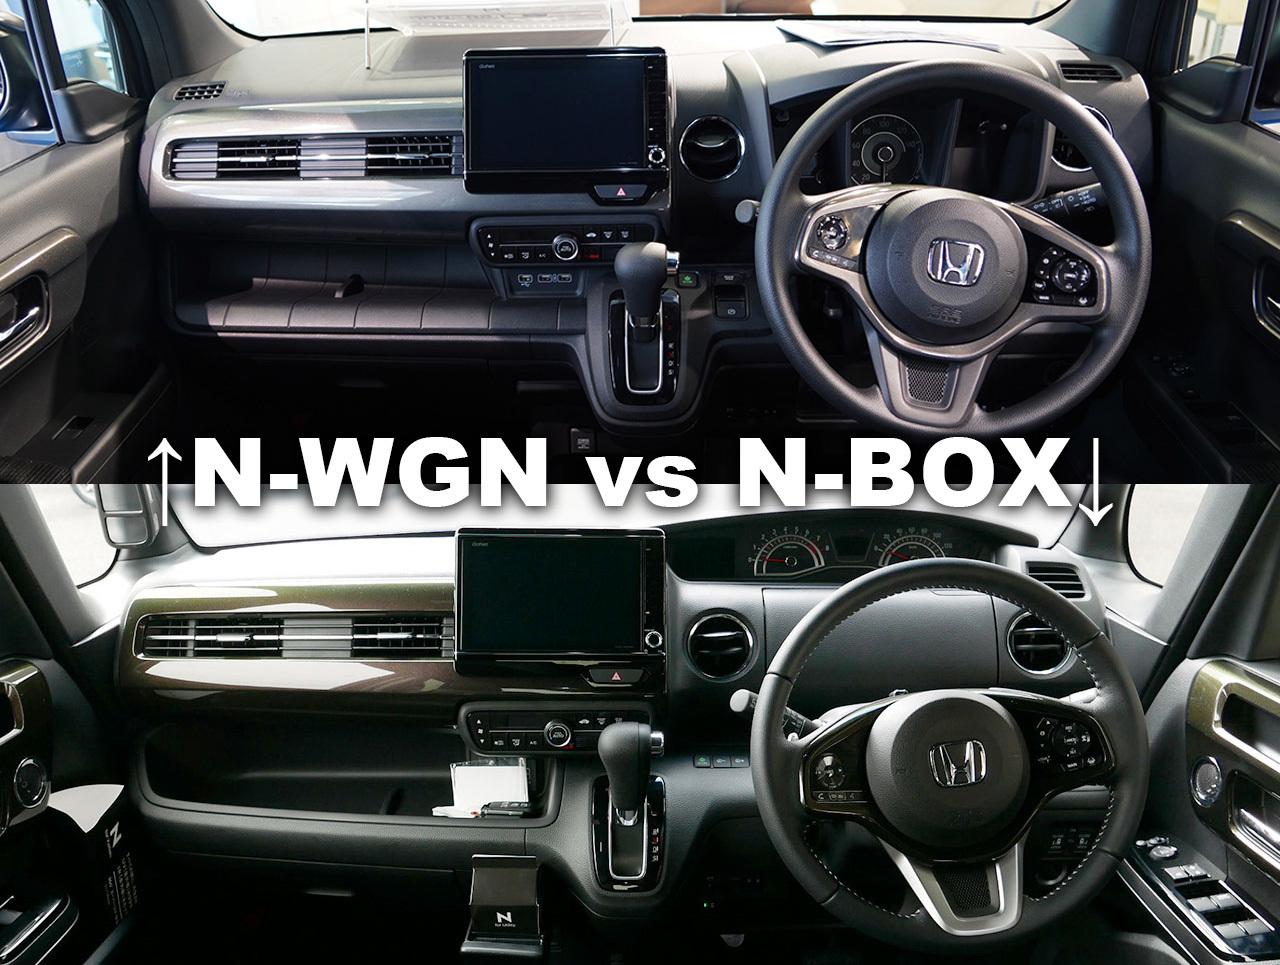 N-WGNvsN-BOX_2019092910535409f.jpg